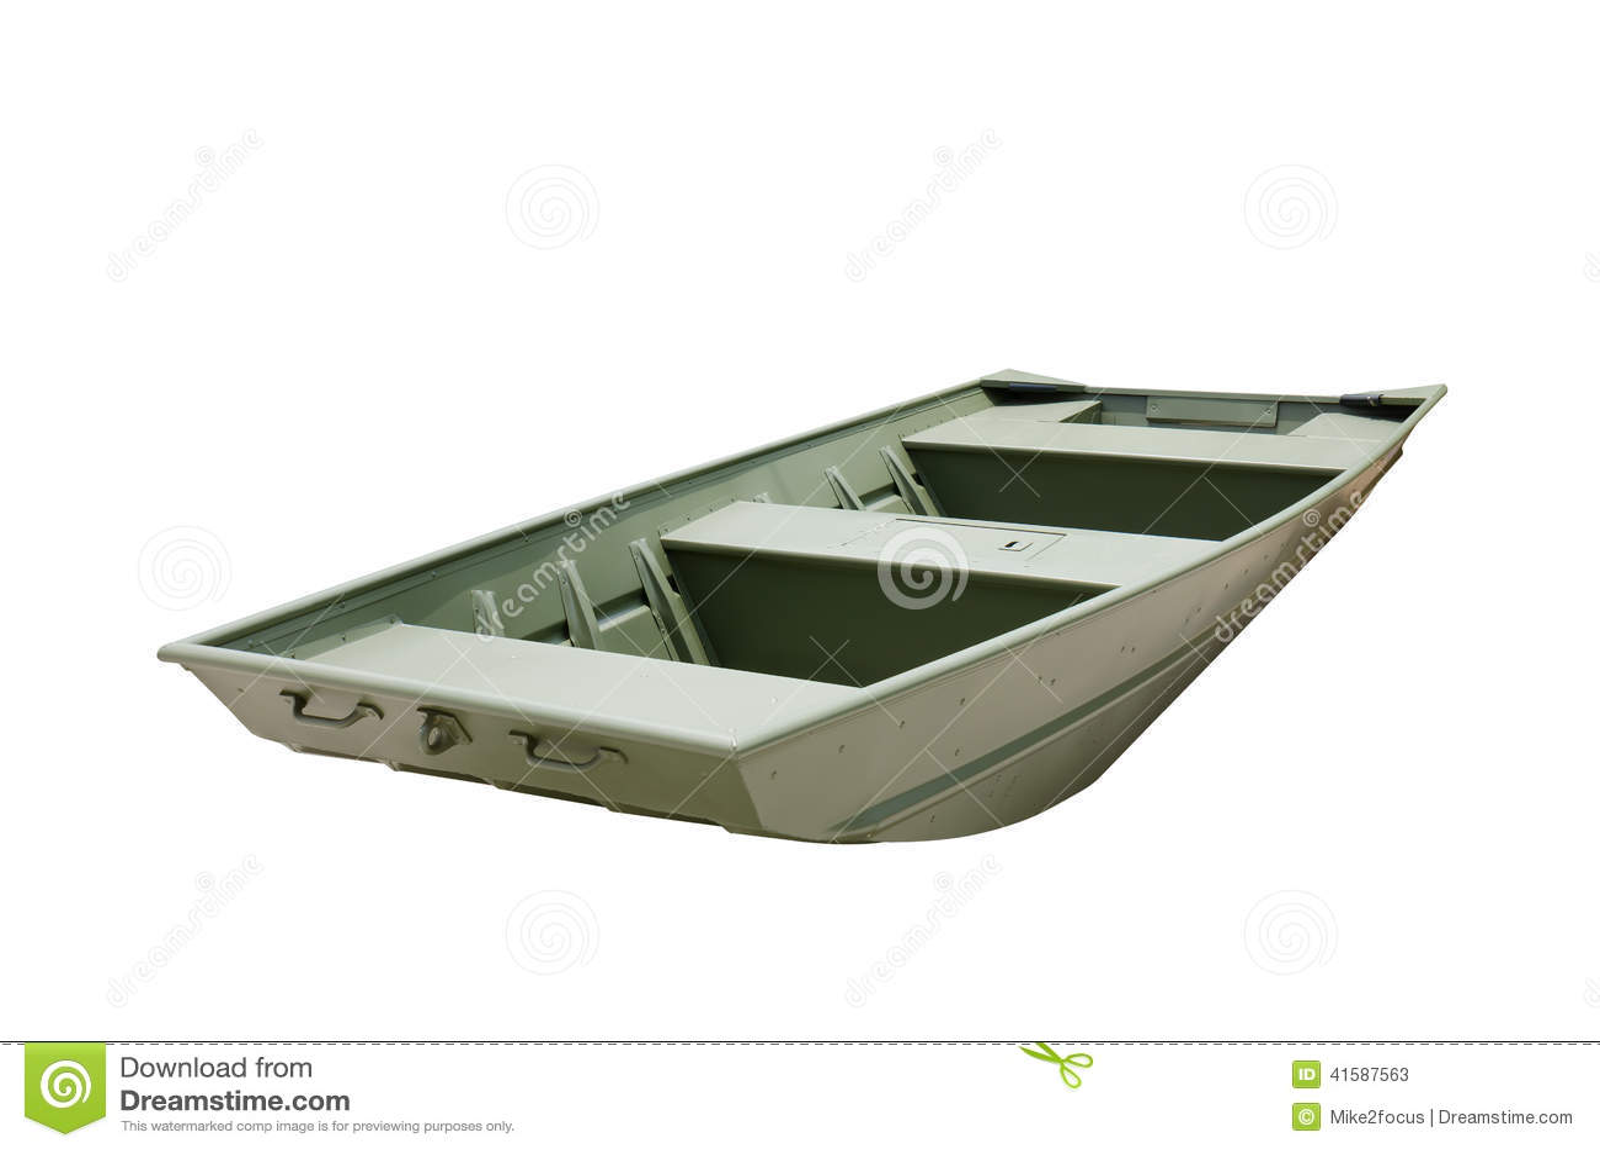 Flat Bottom Aluminum John Jon Boat Painted Green Stock Photo - Image ...